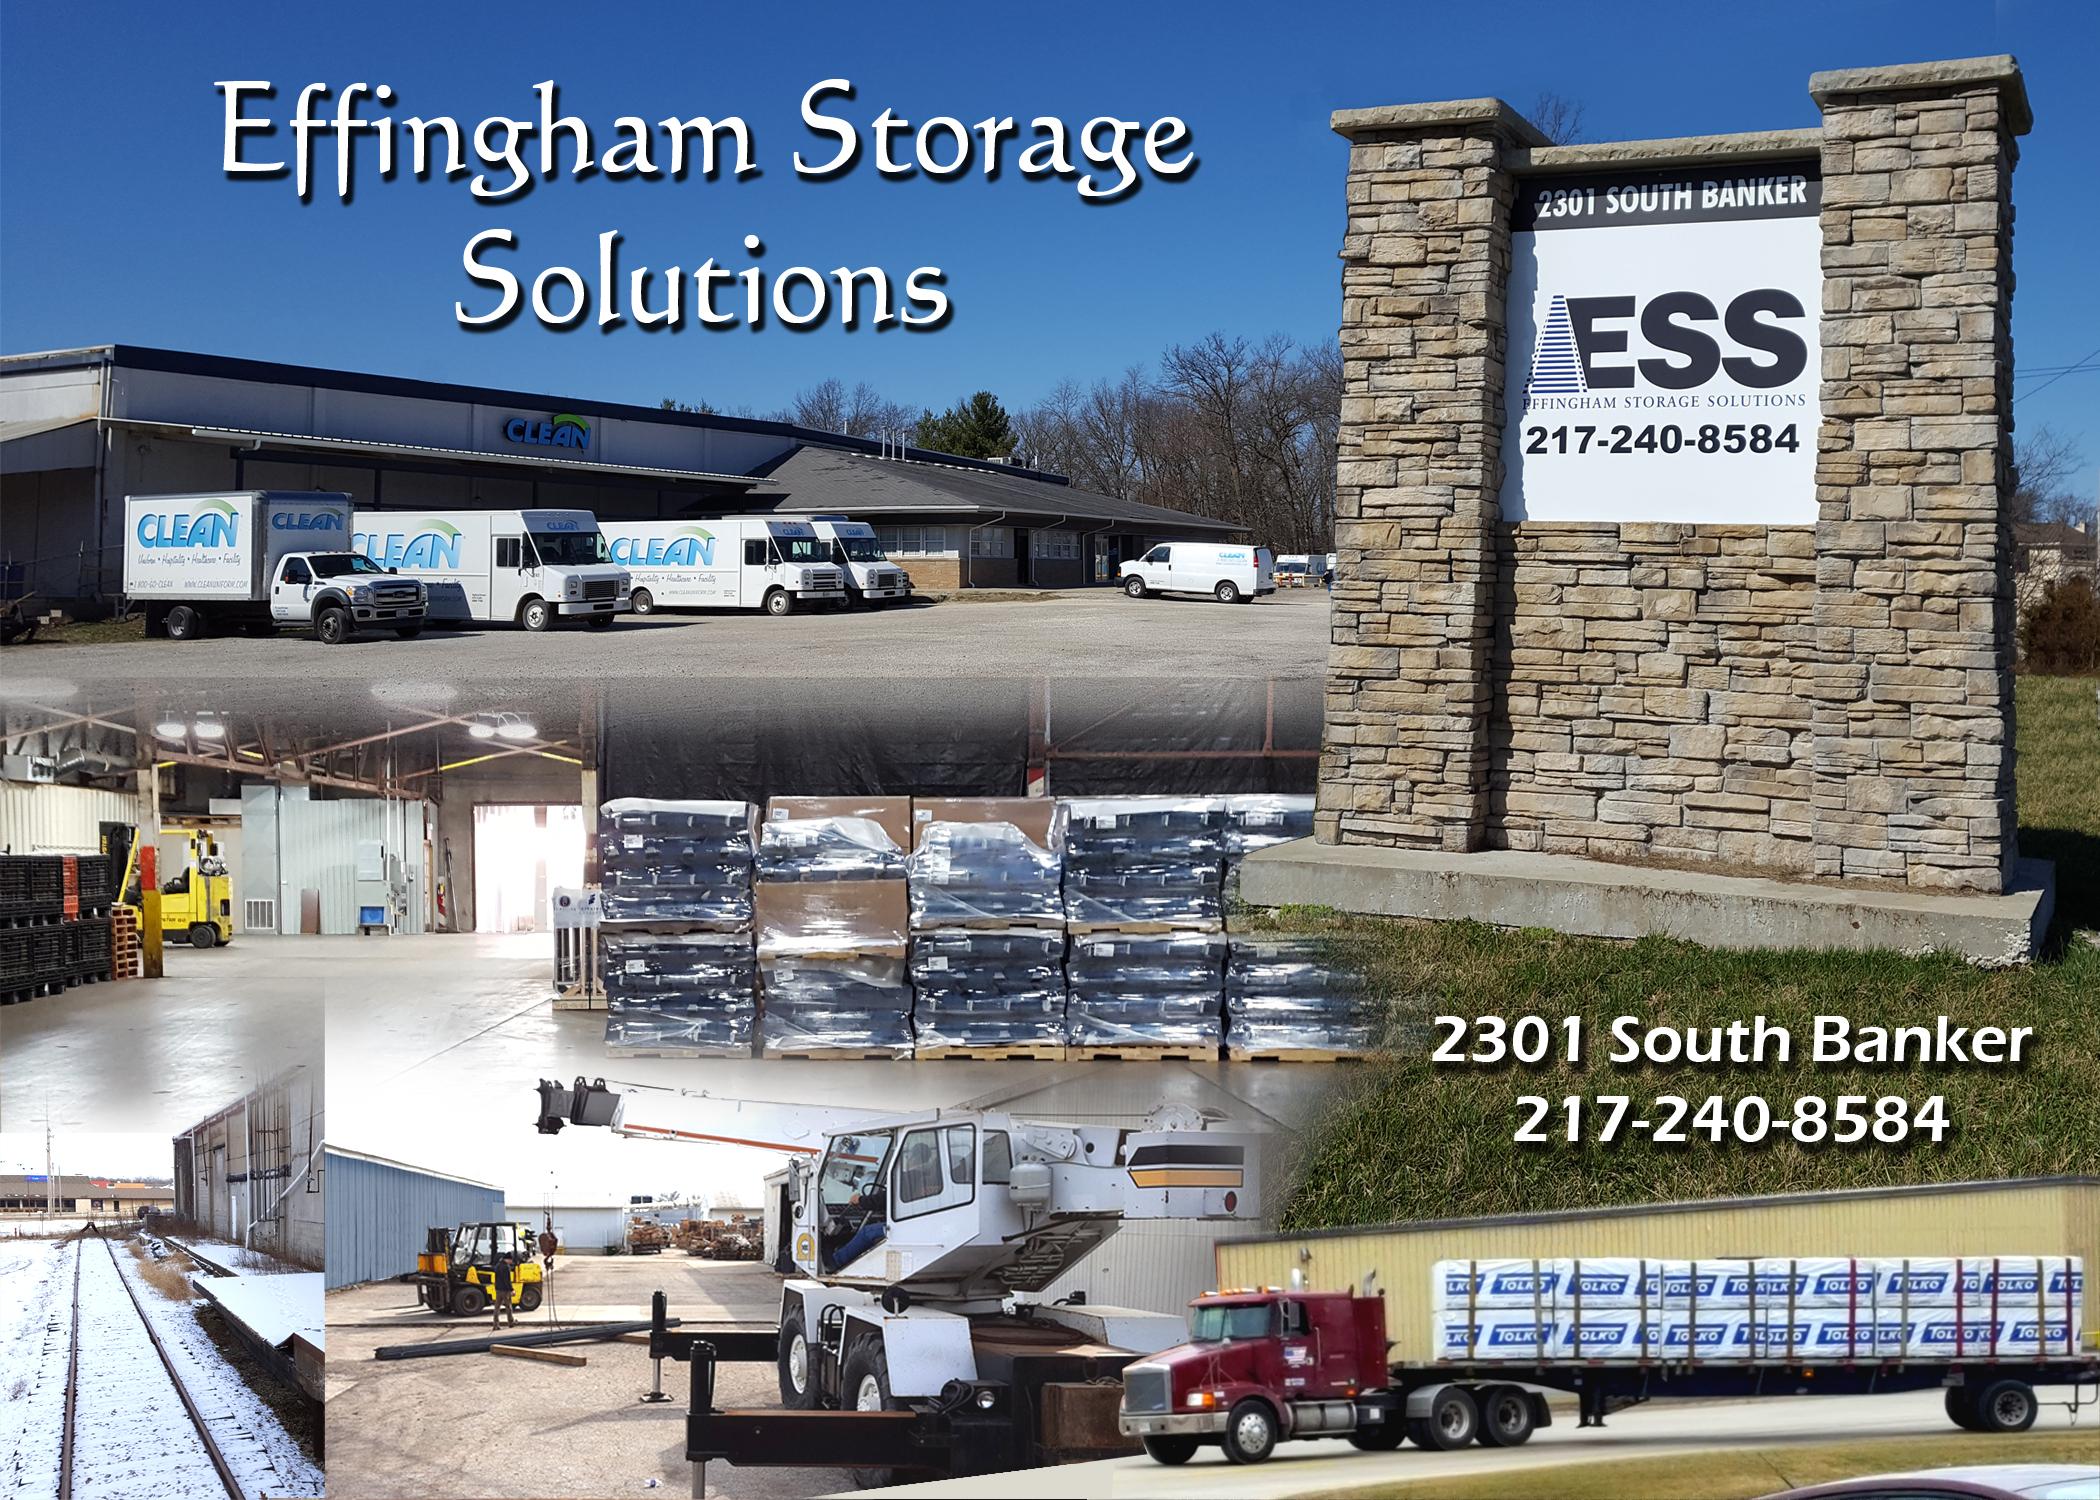 Effingham Storage Solutions